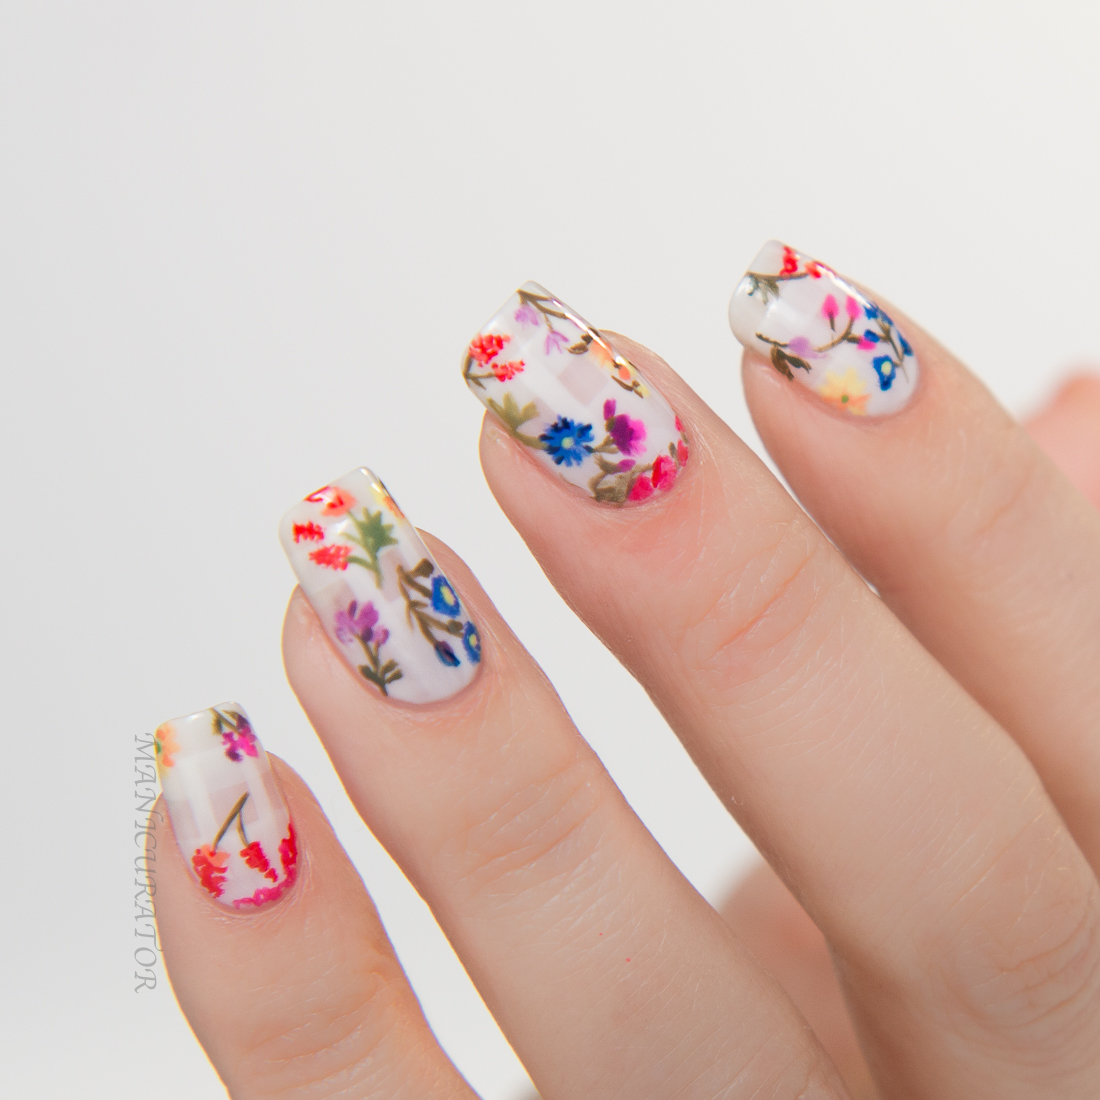 Nail-Art-Emmy-Rossum-Oscar-de-la-Renta-Nailart